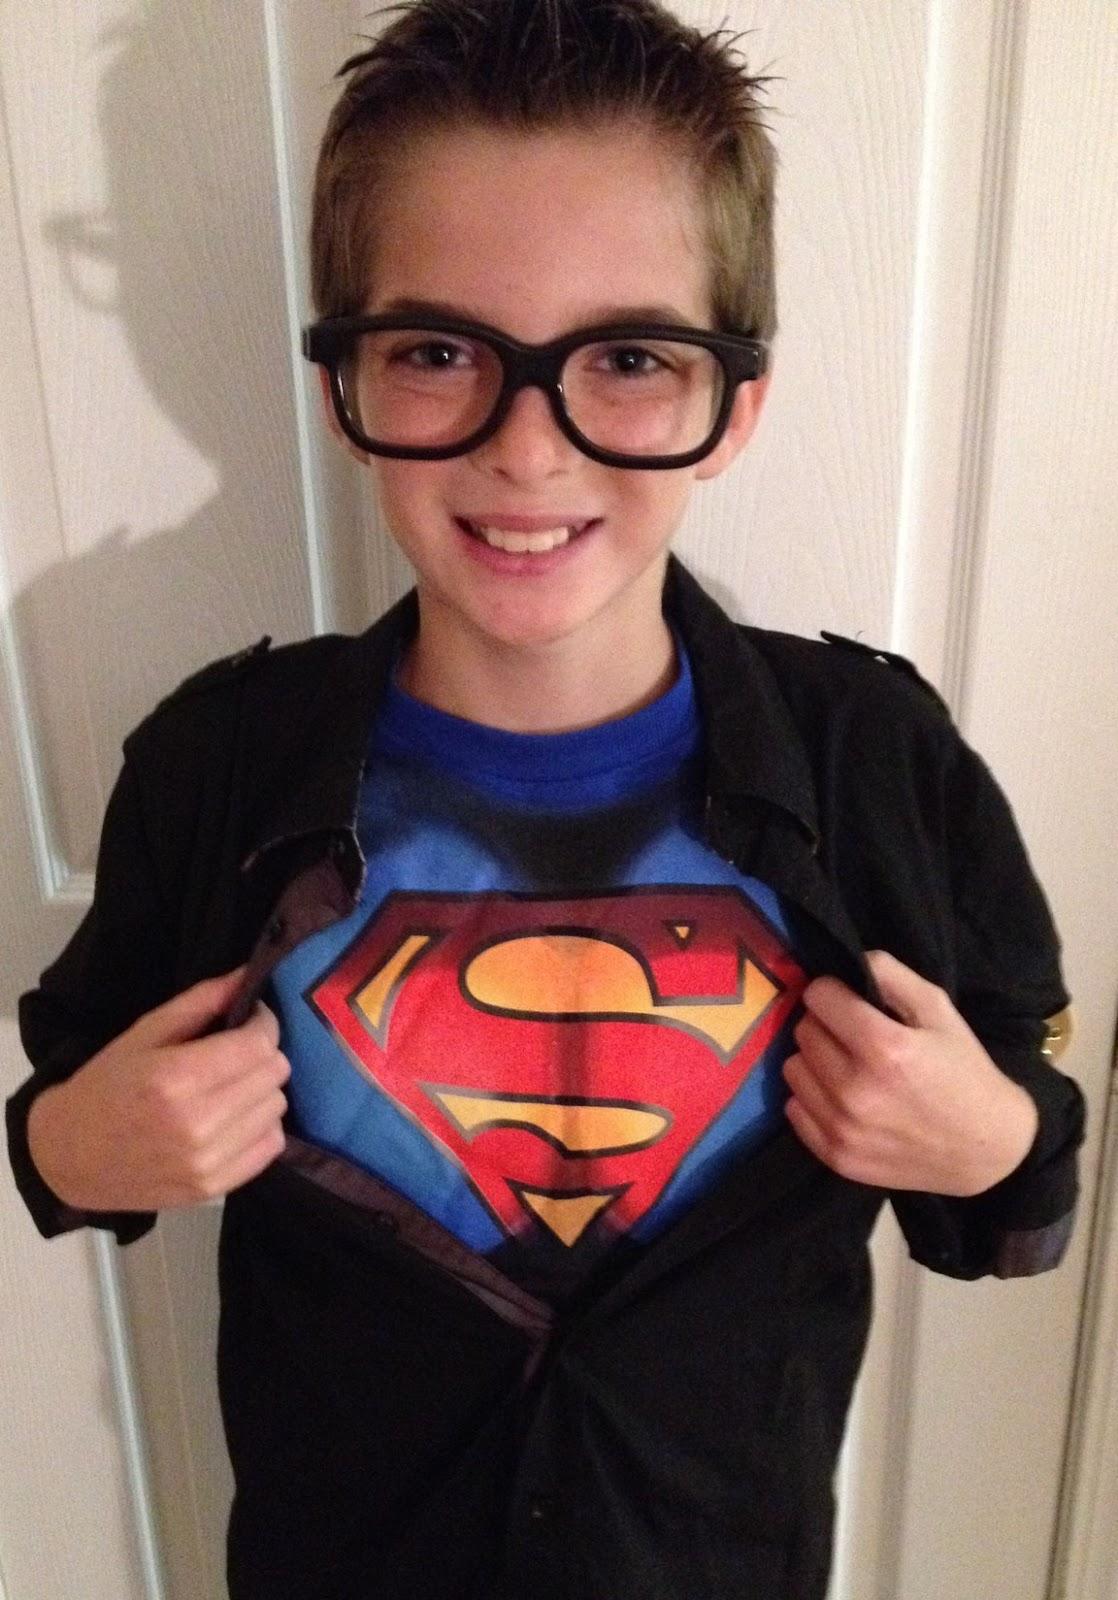 superman halloween costume costumes idea  sc 1 st  Costume Crafty & Costume Crafty: How to make a Superman Halloween costume